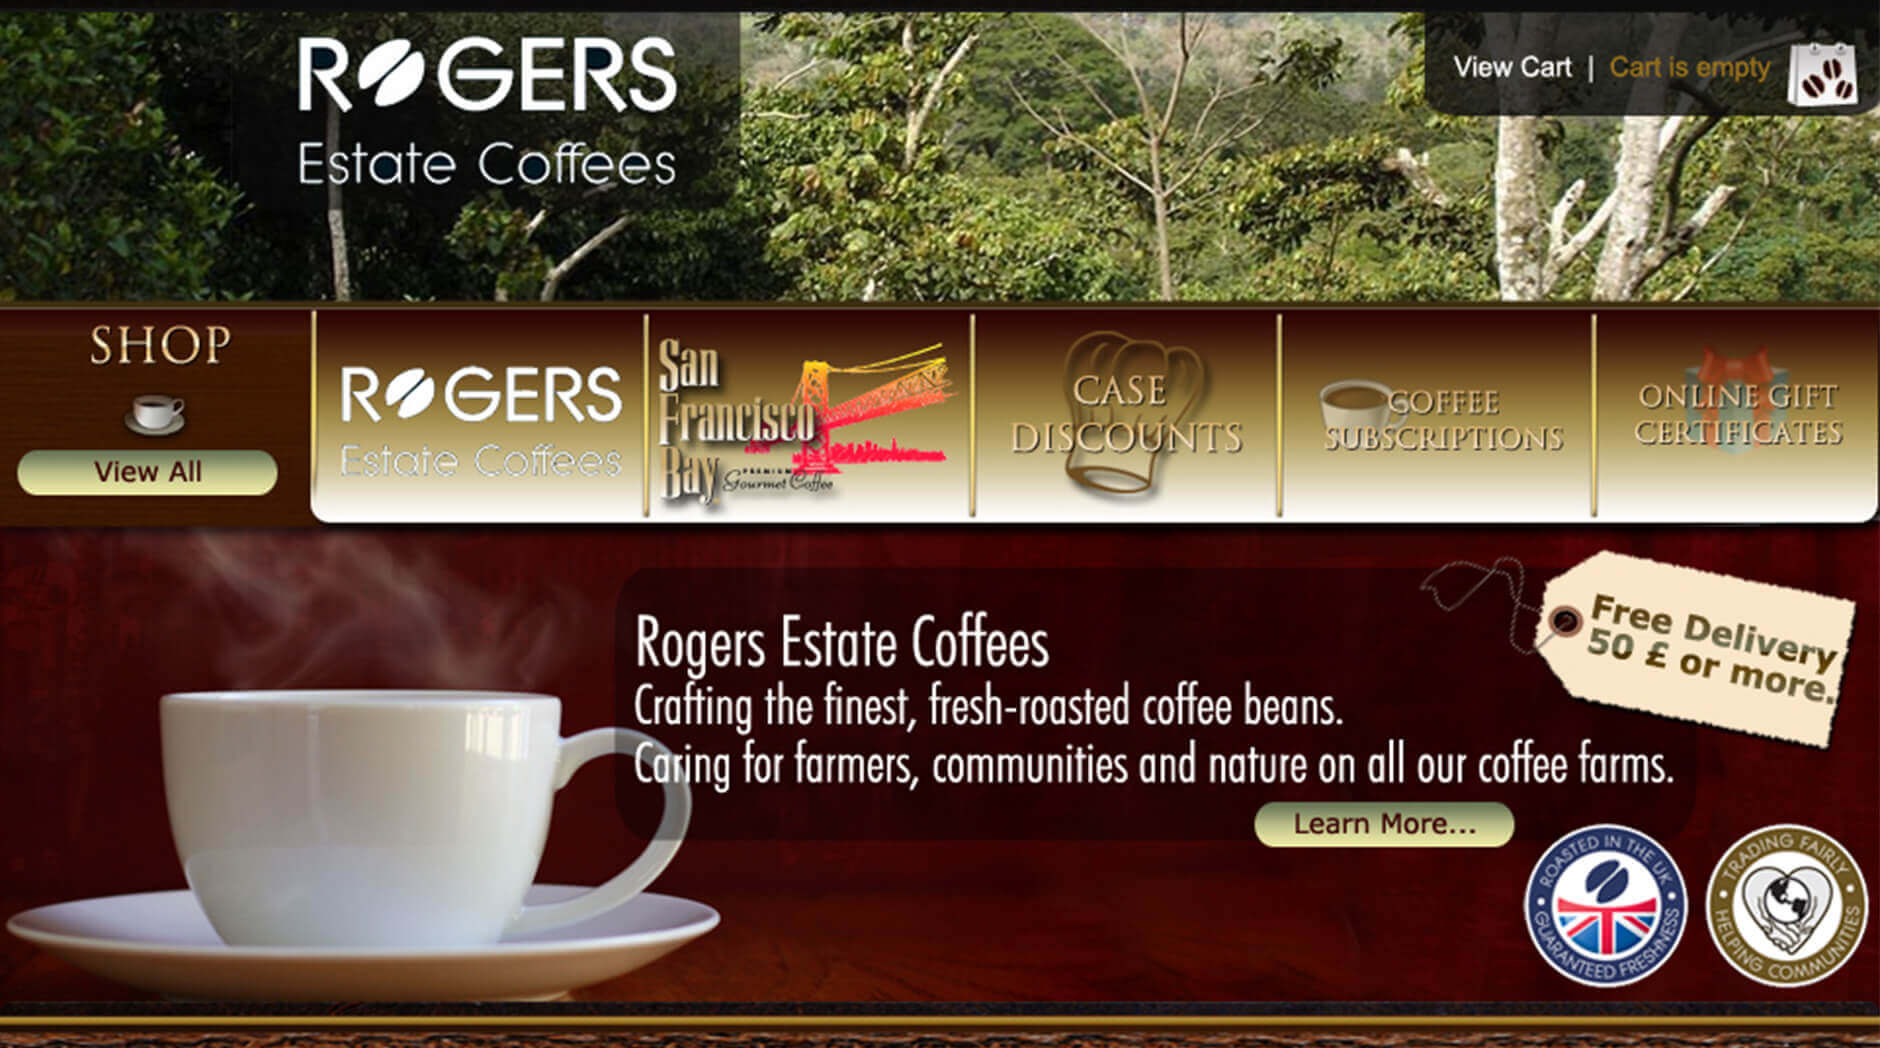 Rogers Estate Coffees 1 Rogers Estate Coffees